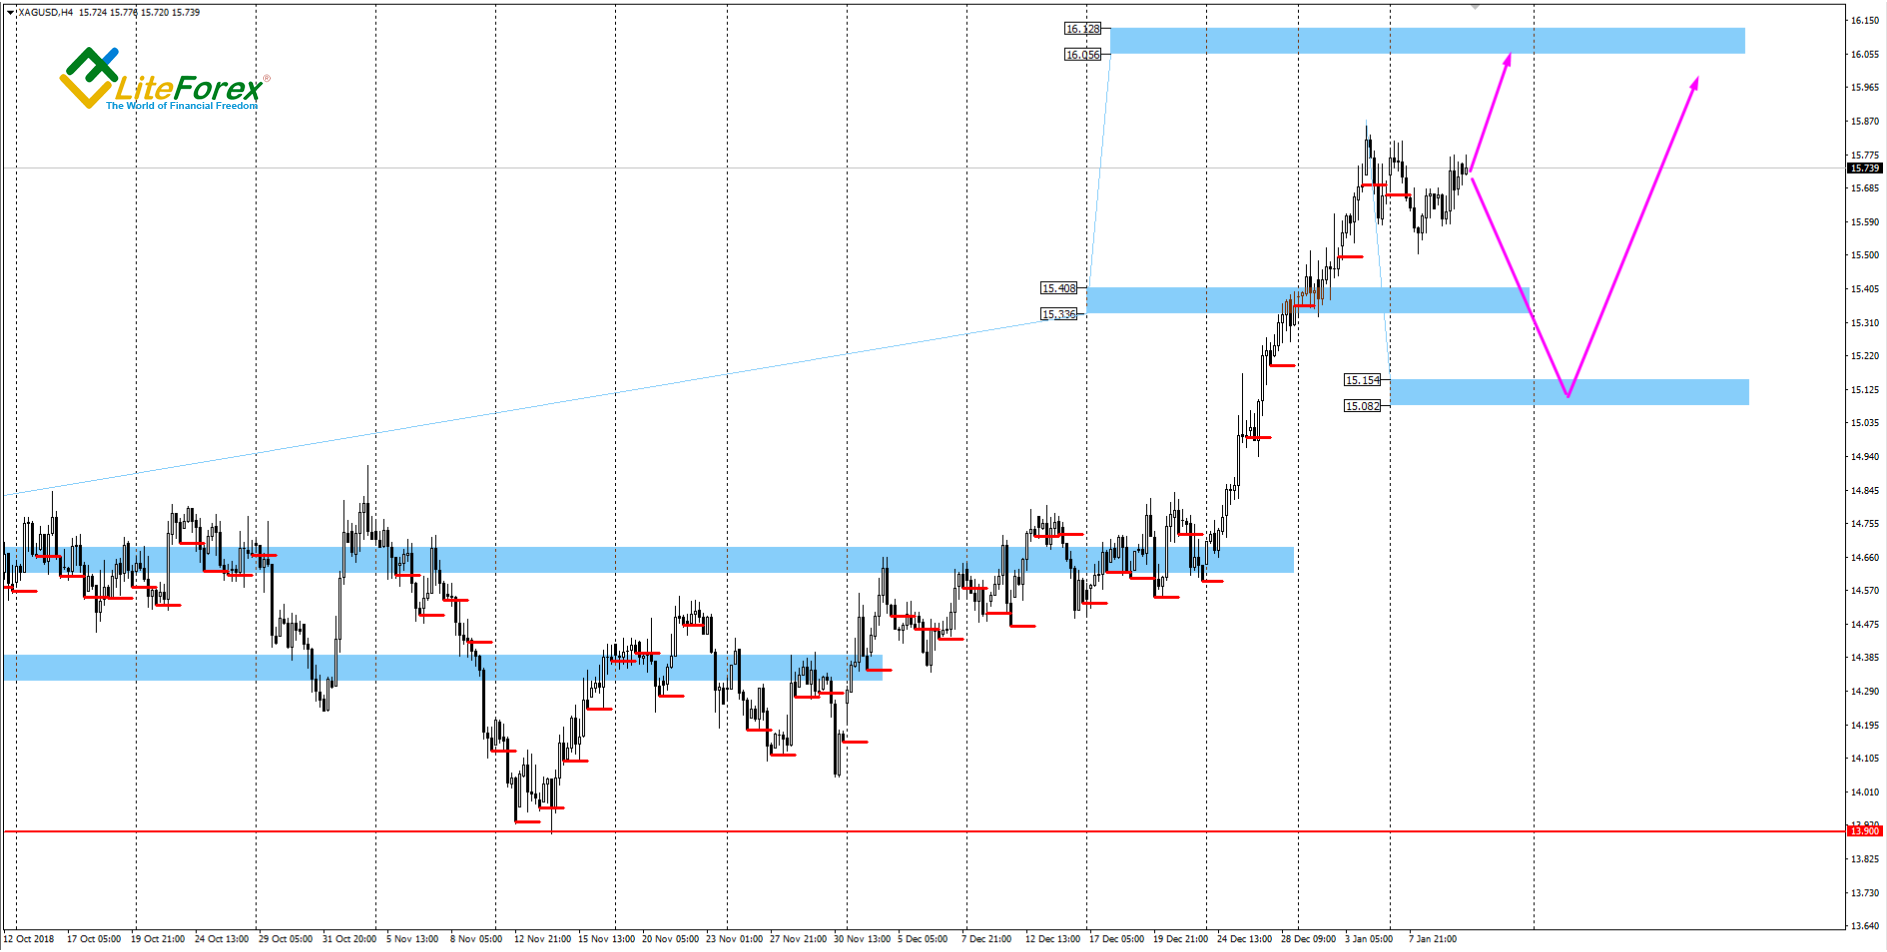 XAG/USD, 4 Hour Chart